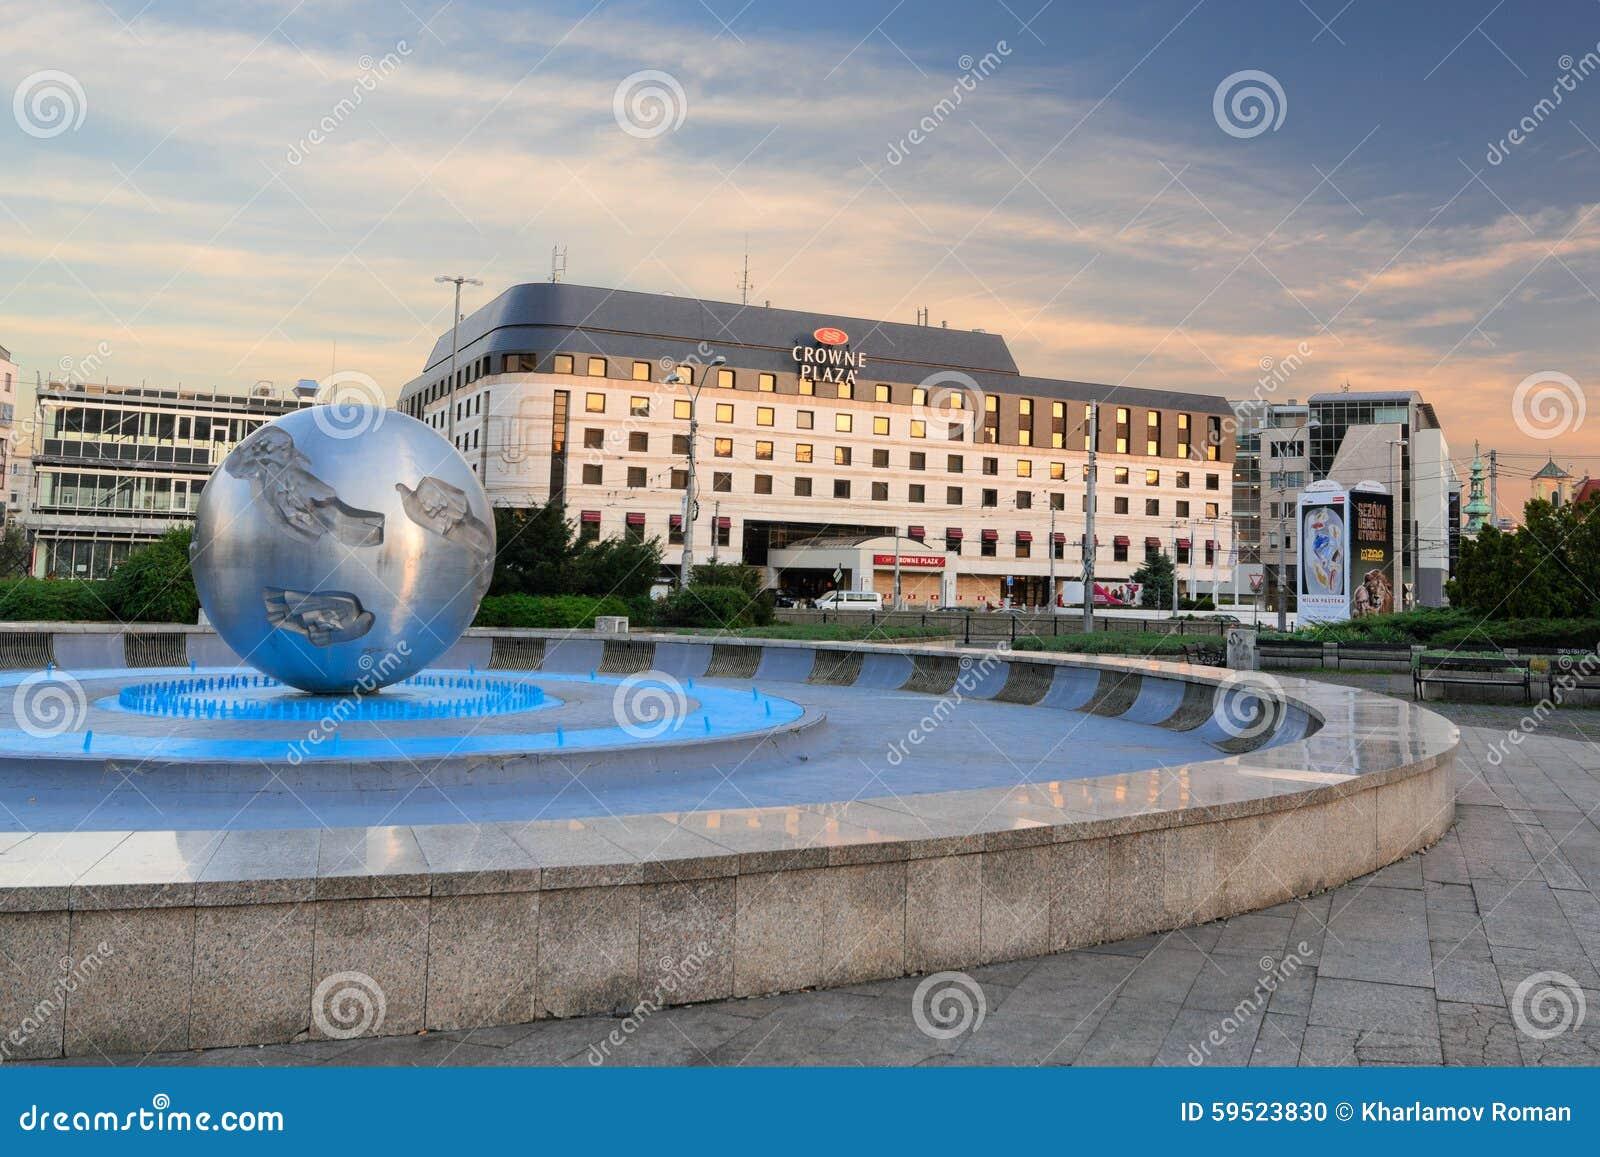 Crown Plaza Bratislava